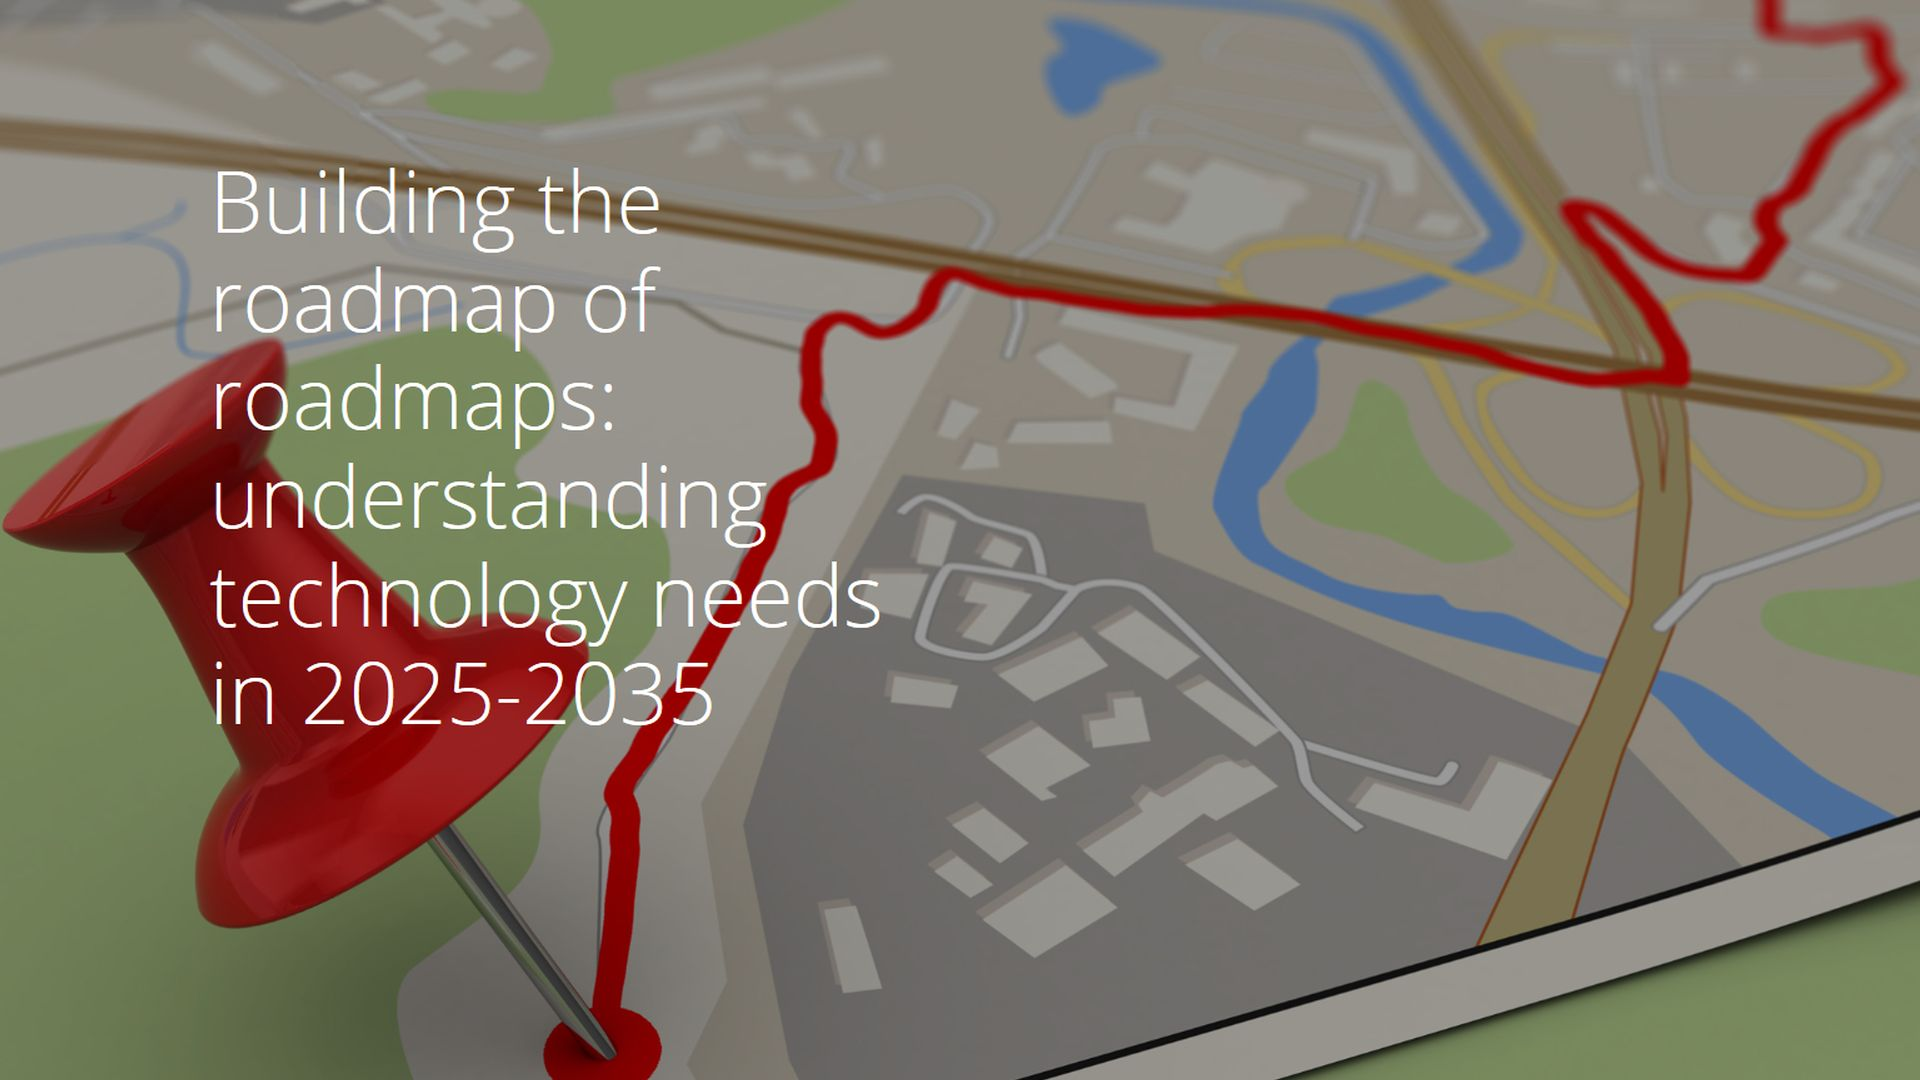 Building the roadmap of roadmaps – Roadmap of